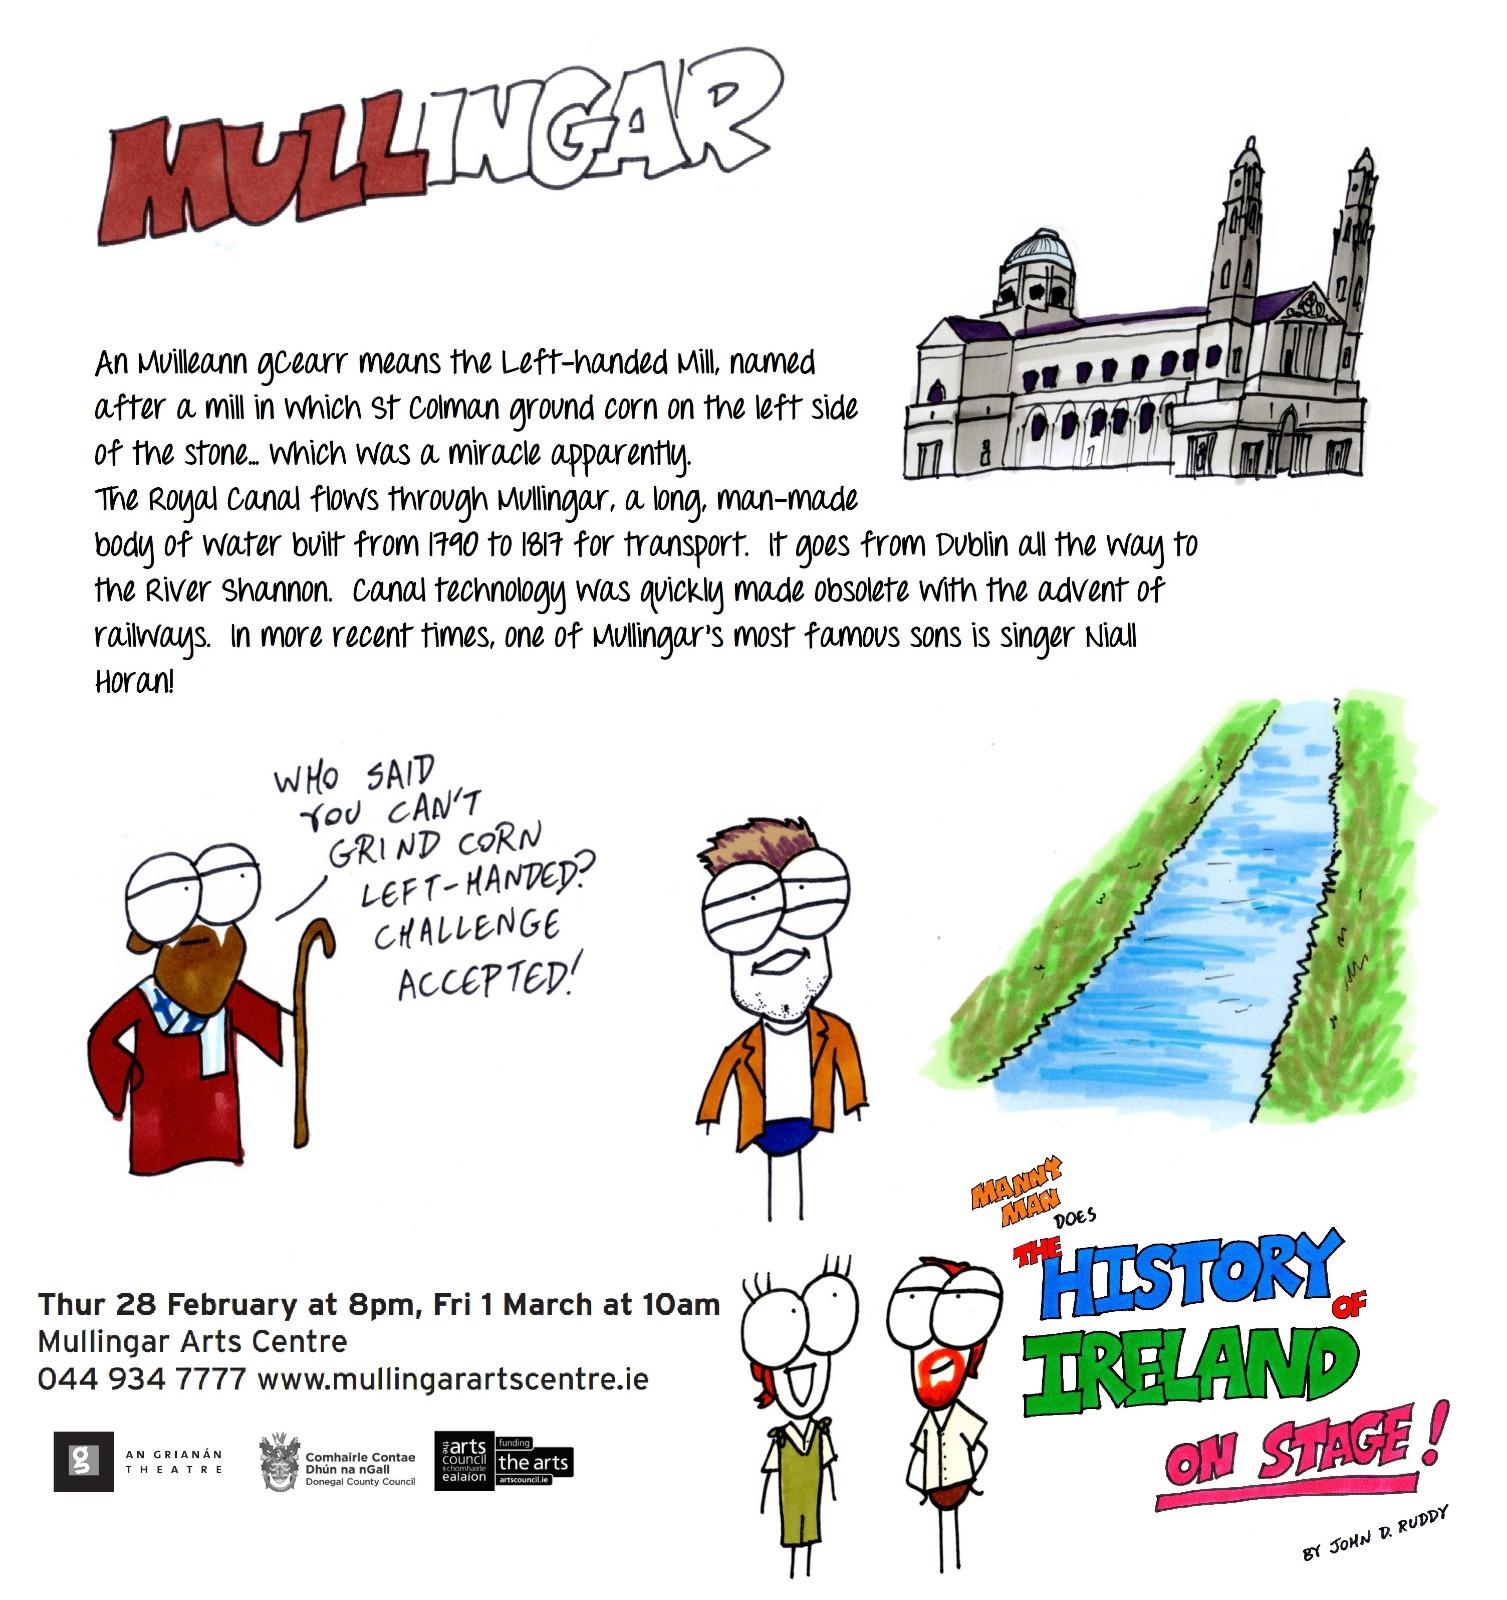 Mullingar Arts Centre, Thu 28 Feb & Sat 1 March